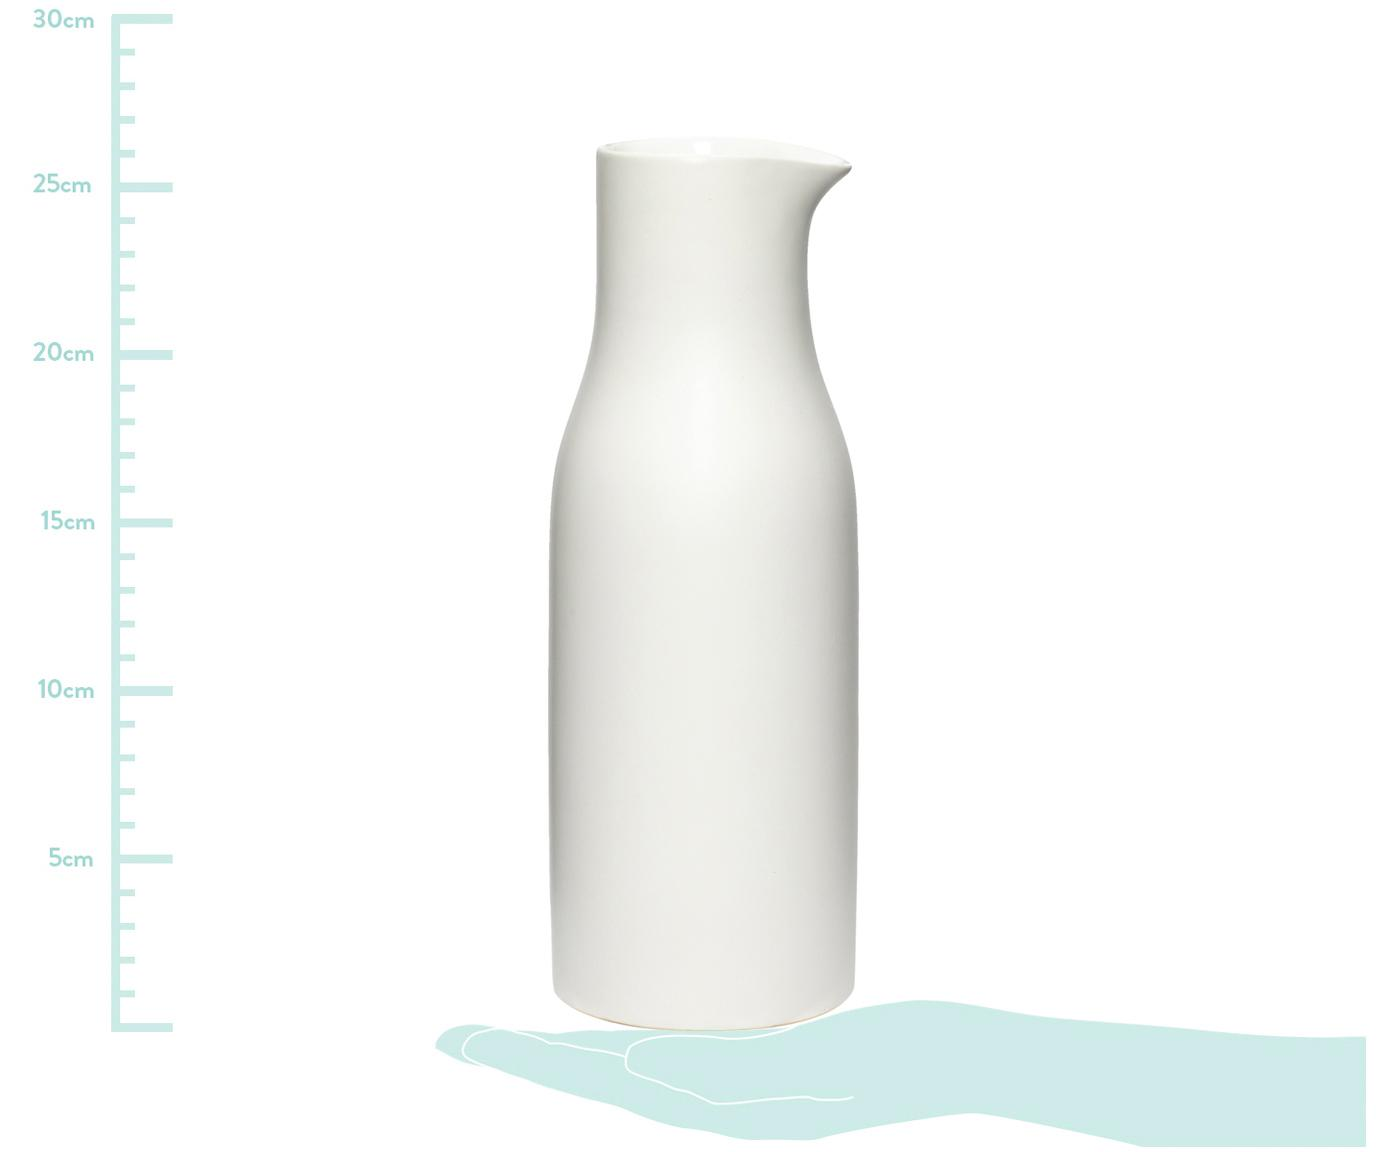 Krug Sogbo, Porzellan, Weiß, 1.5 L